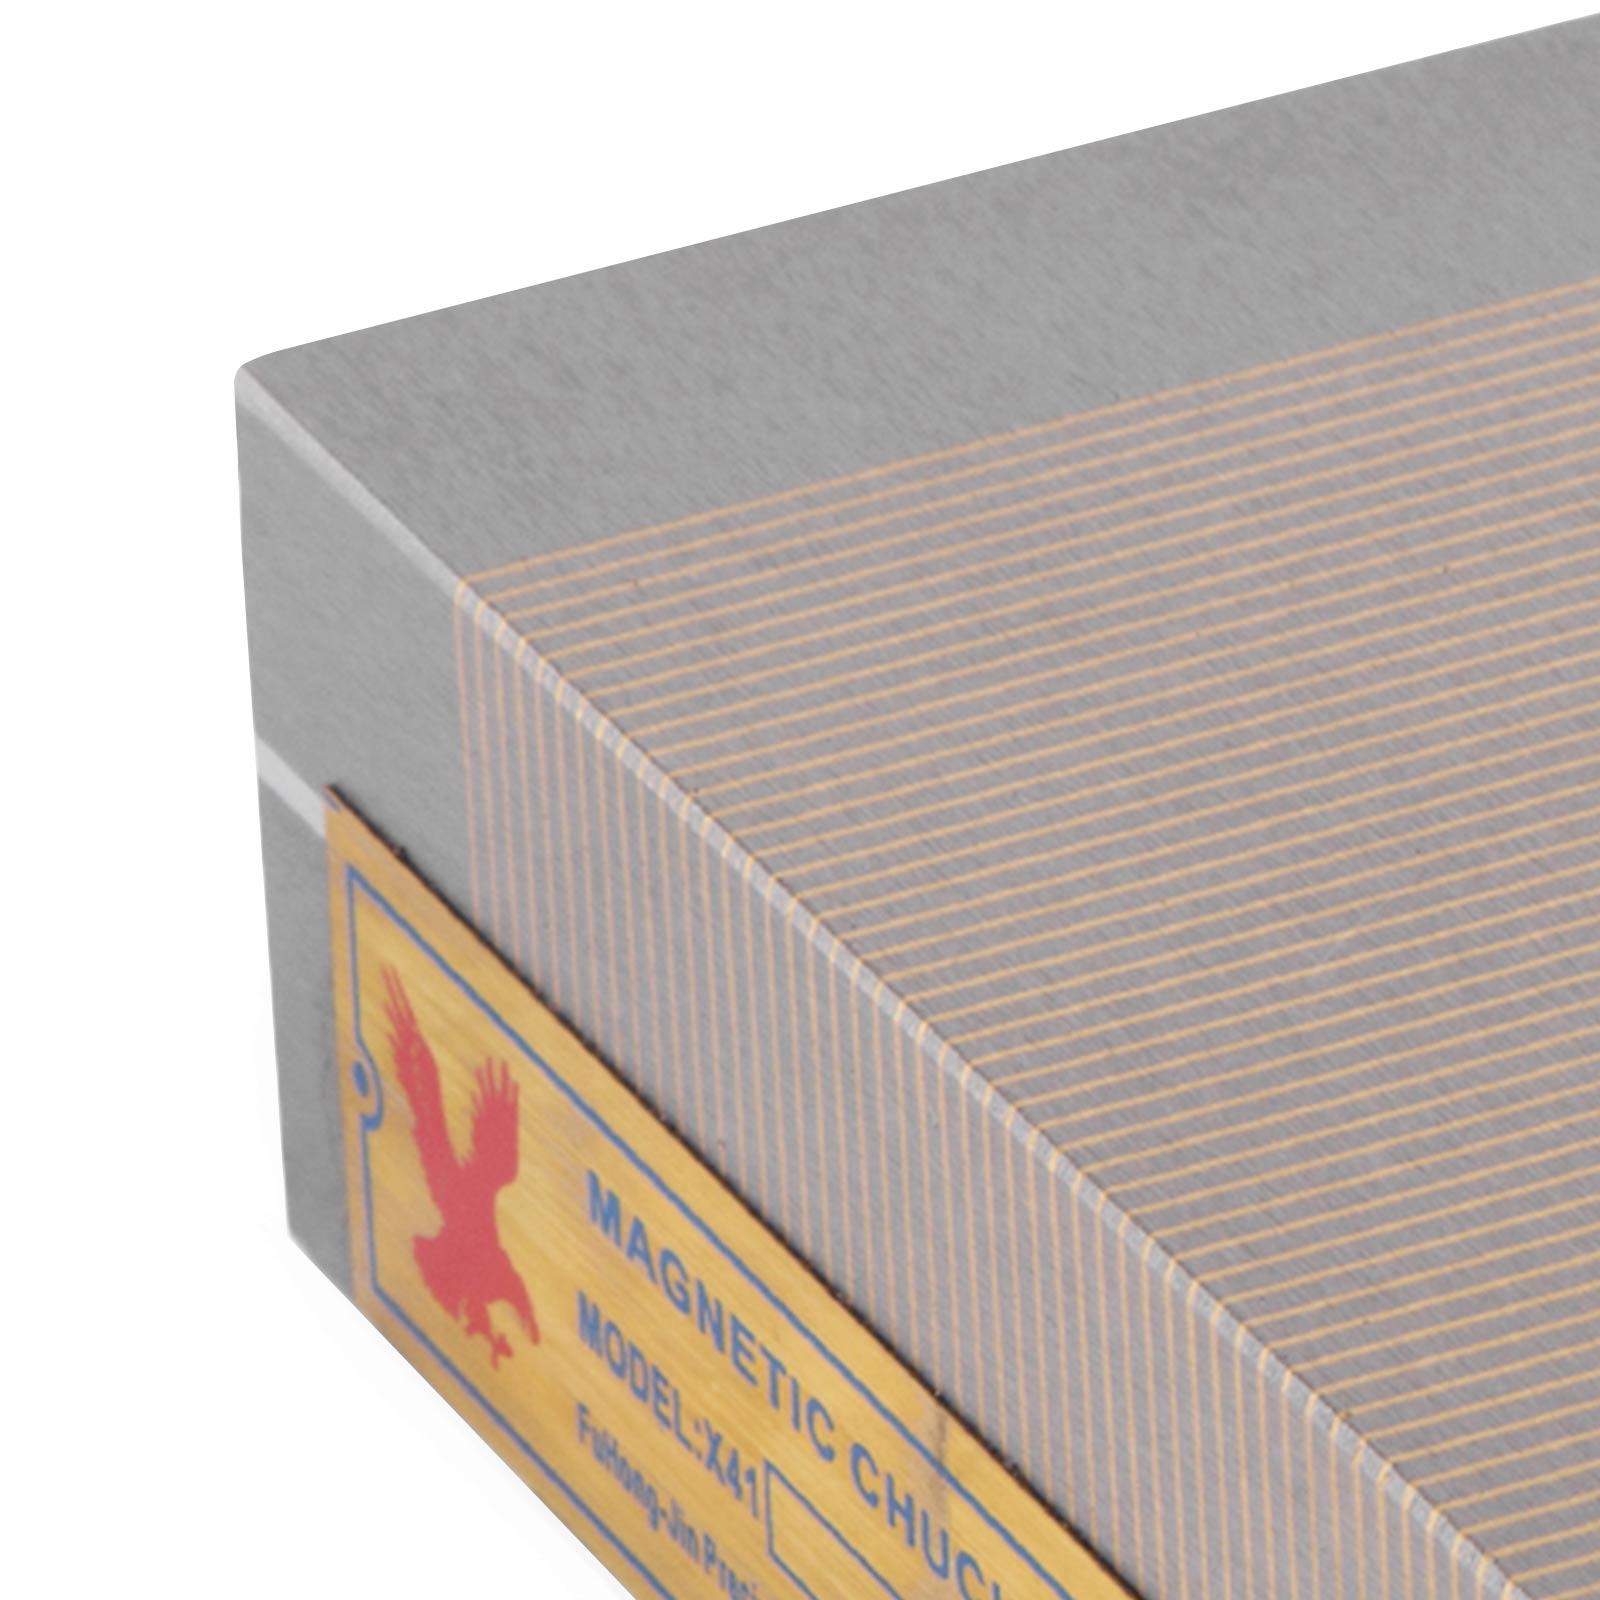 500x Kabelschellen Nagelschellen Kabelklemmen Kabelbefestigung weiss ø 16,0mm